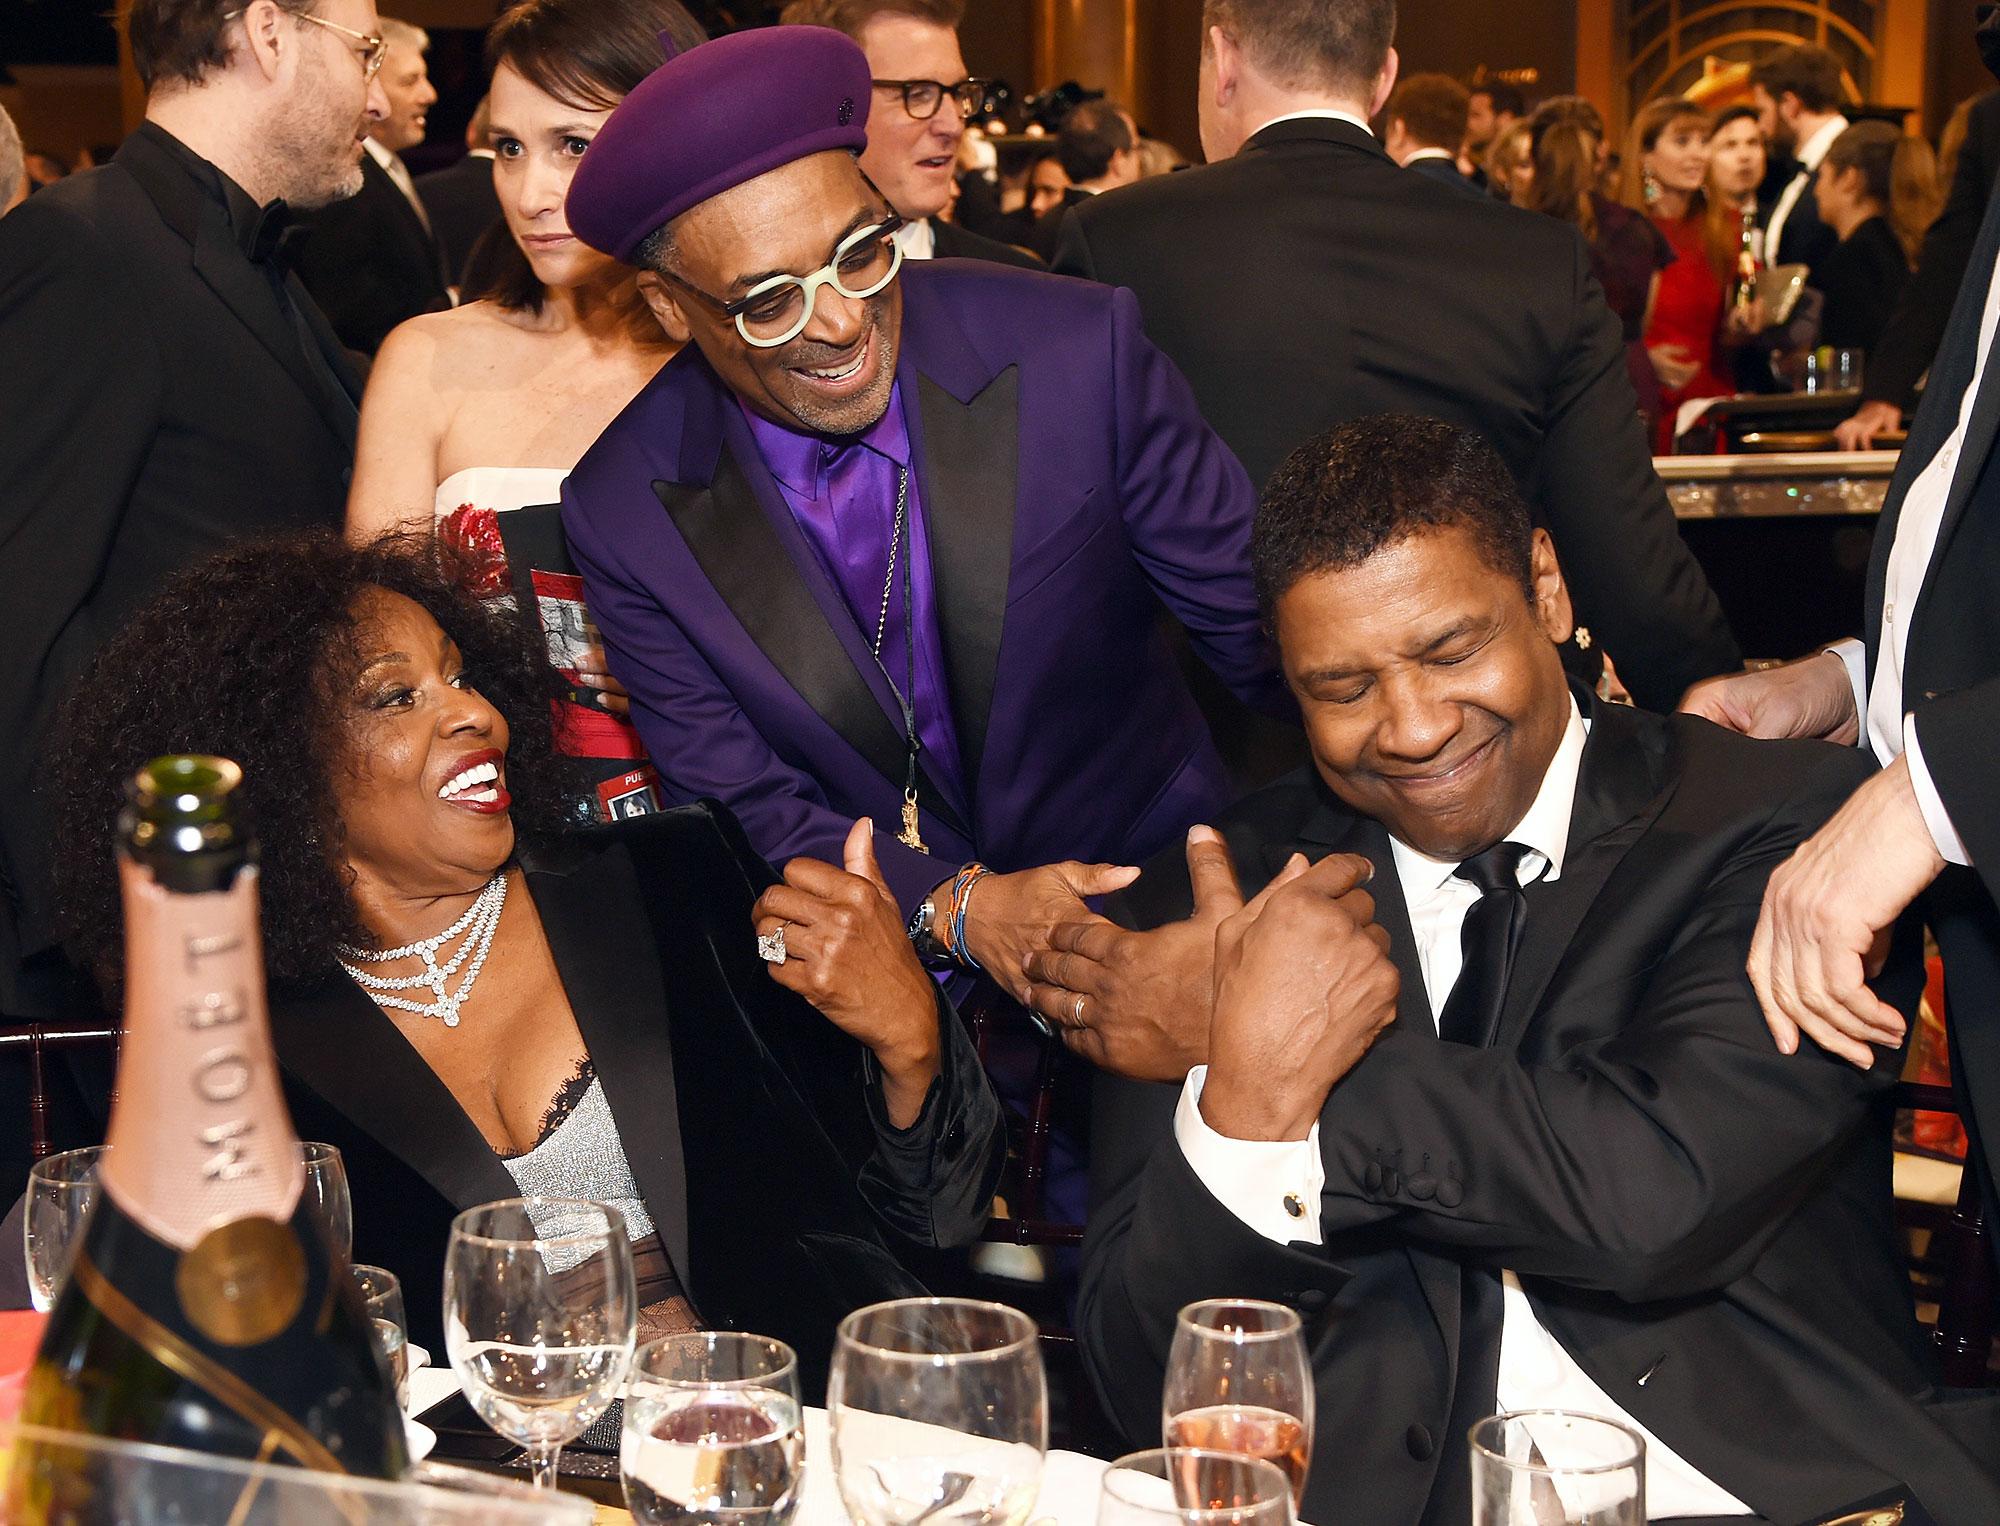 Inside Golden Globes 2019 Pauletta Washinton Spike Lee Denzel Washington - Spike Lee had a surprise greeting for Denzel Washington and wife Pauletta Washington .